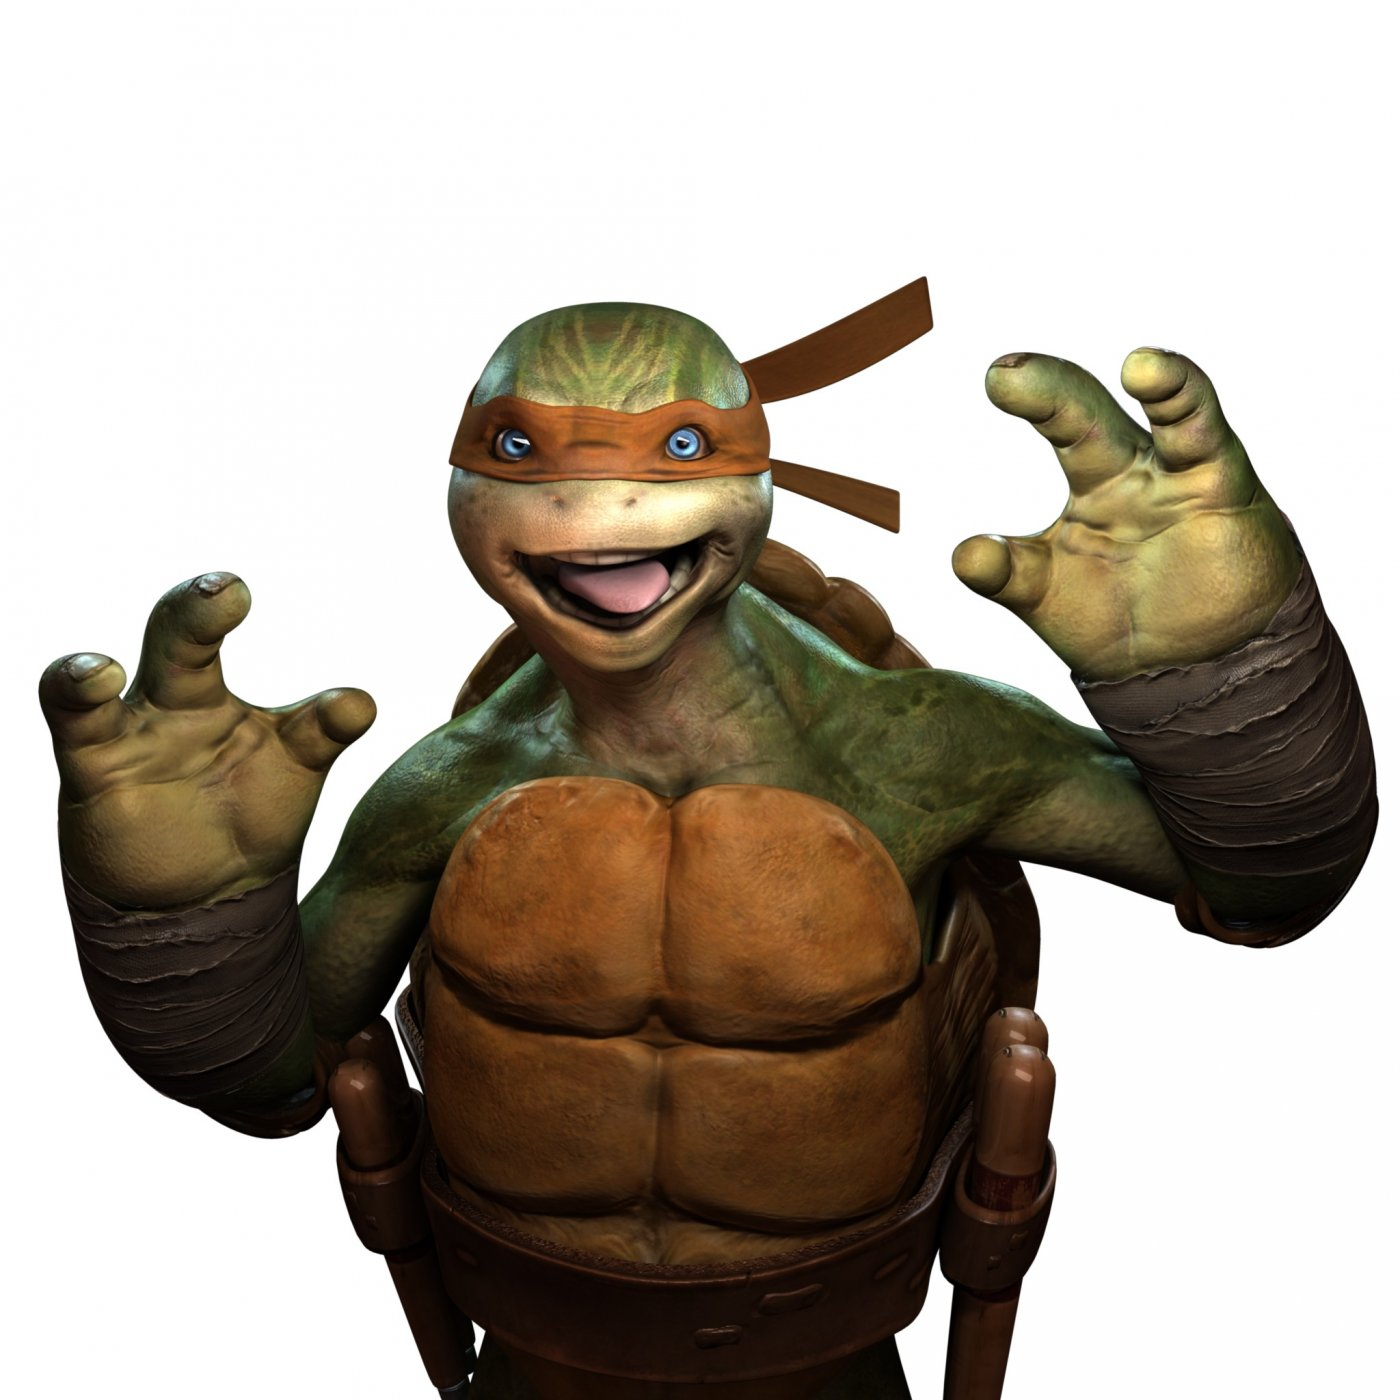 mike portrait jpg 1400x0 q85 لاکپشت ها در برابر نینجاها | پیش نمایش بازی TMNT: Out of the Shadows